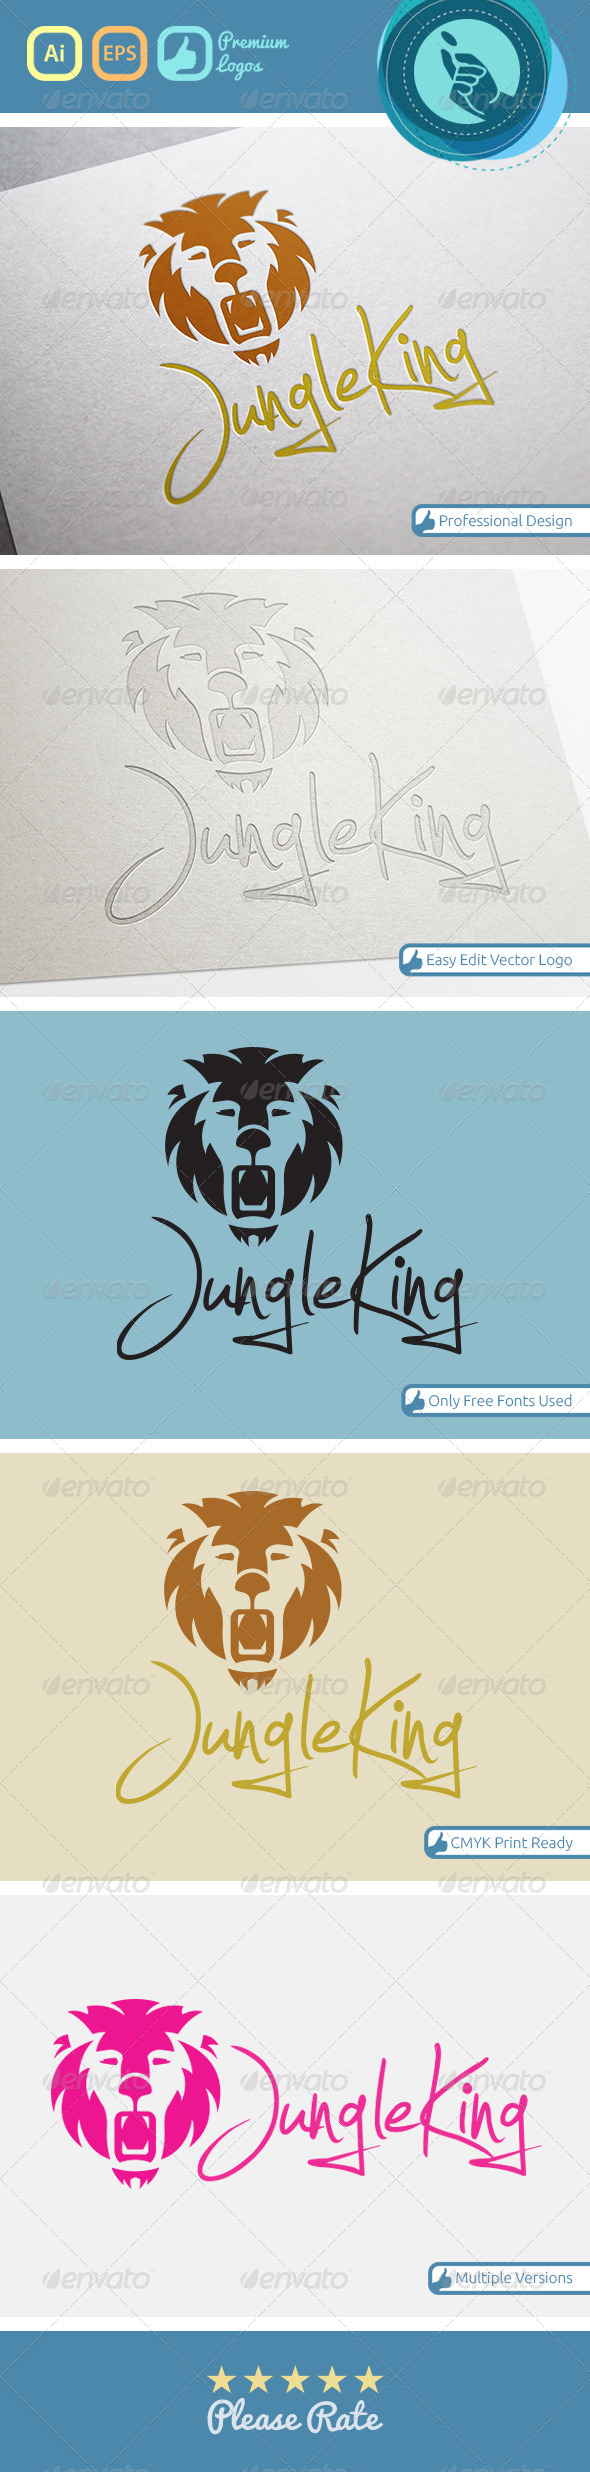 GraphicRiver Jungle king logo 4534766